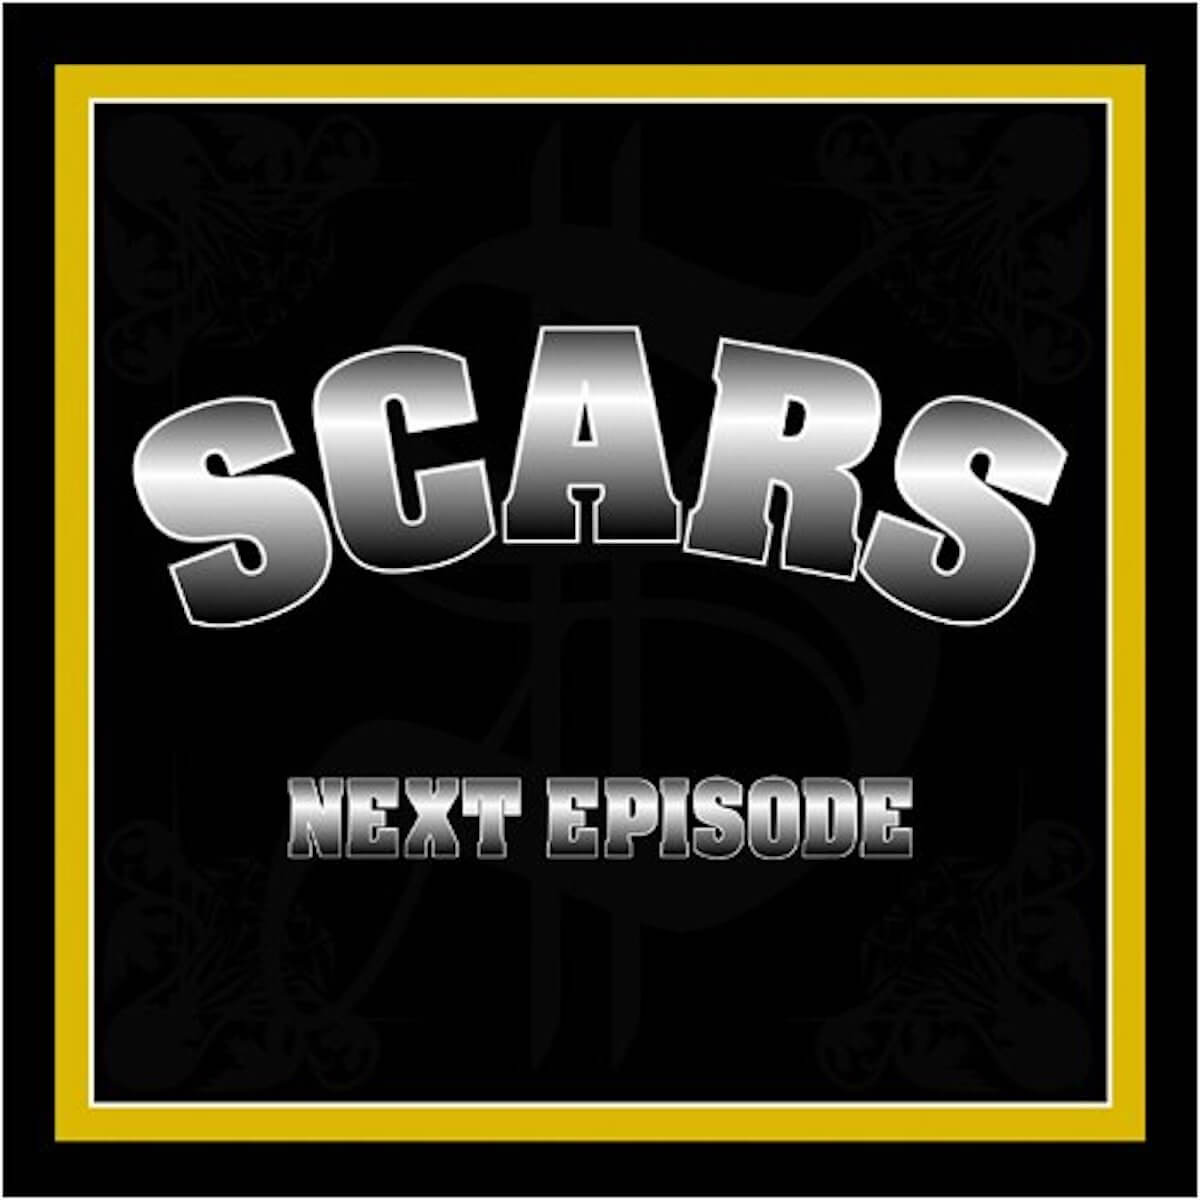 SCARS、『THE ALBUM』に続いてセカンドアルバム『NEXT EPISODE』のリイシューも決定 music190528-scars